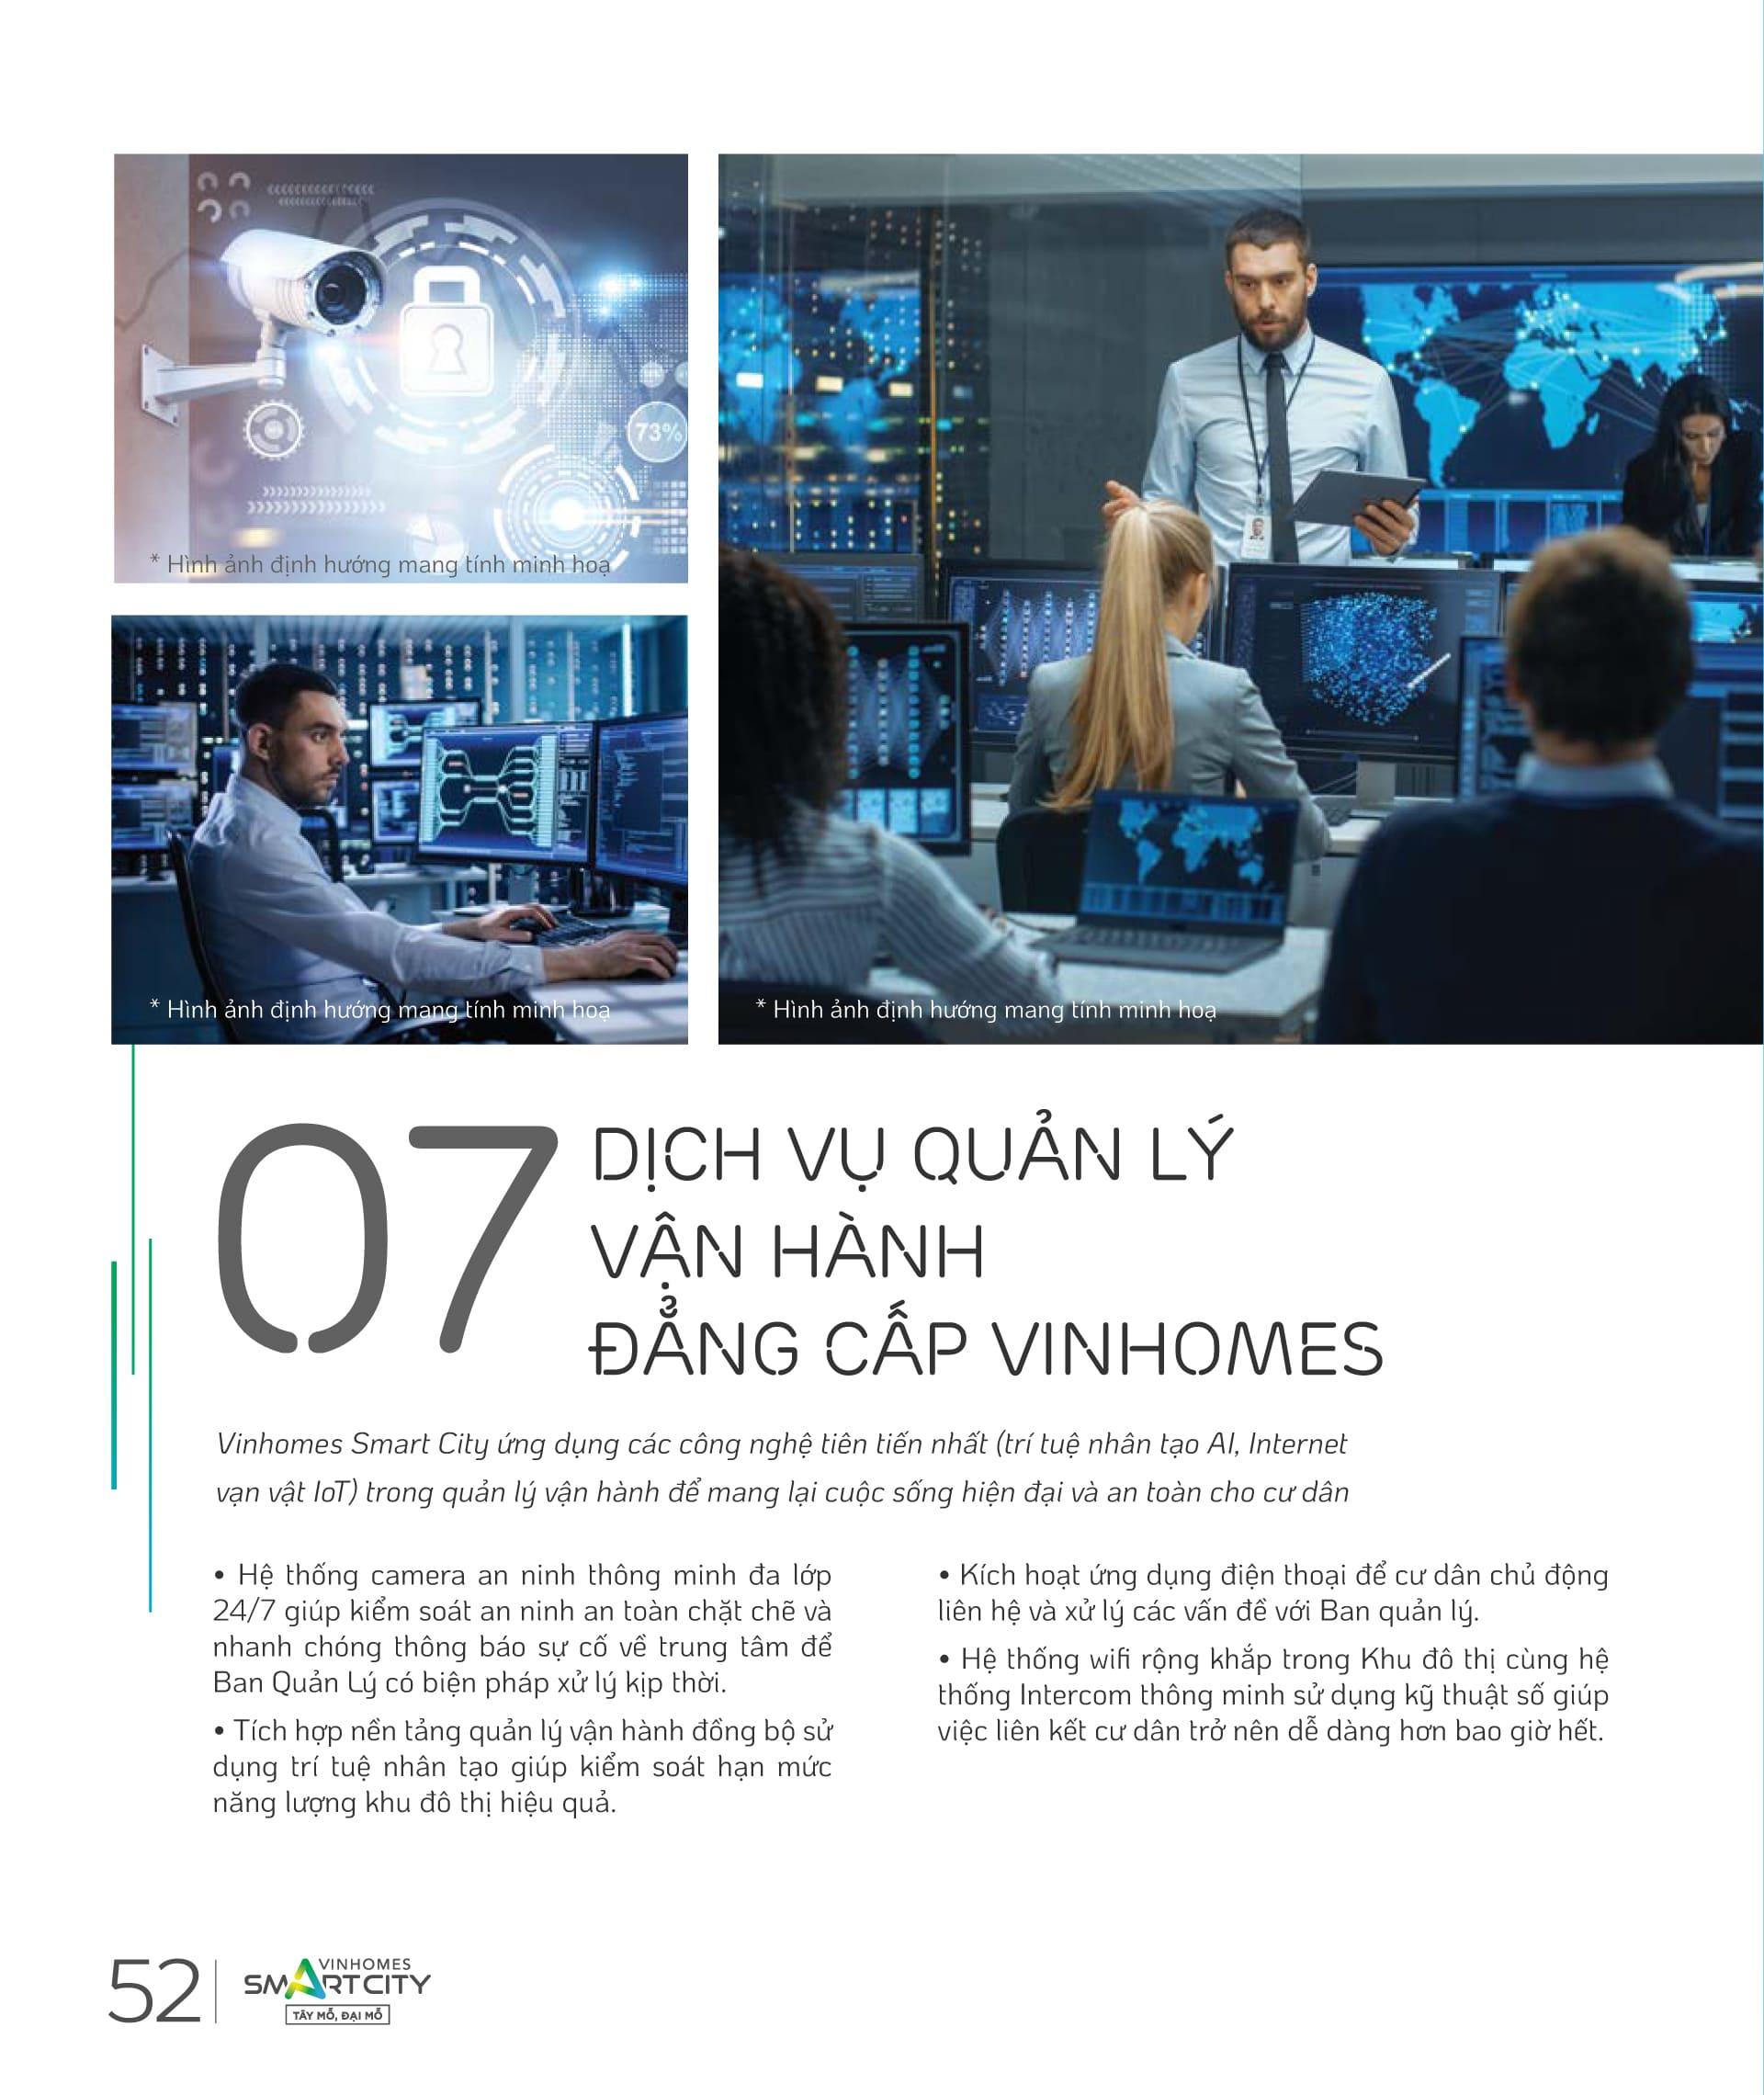 tiện ích vinhomes smart city 26